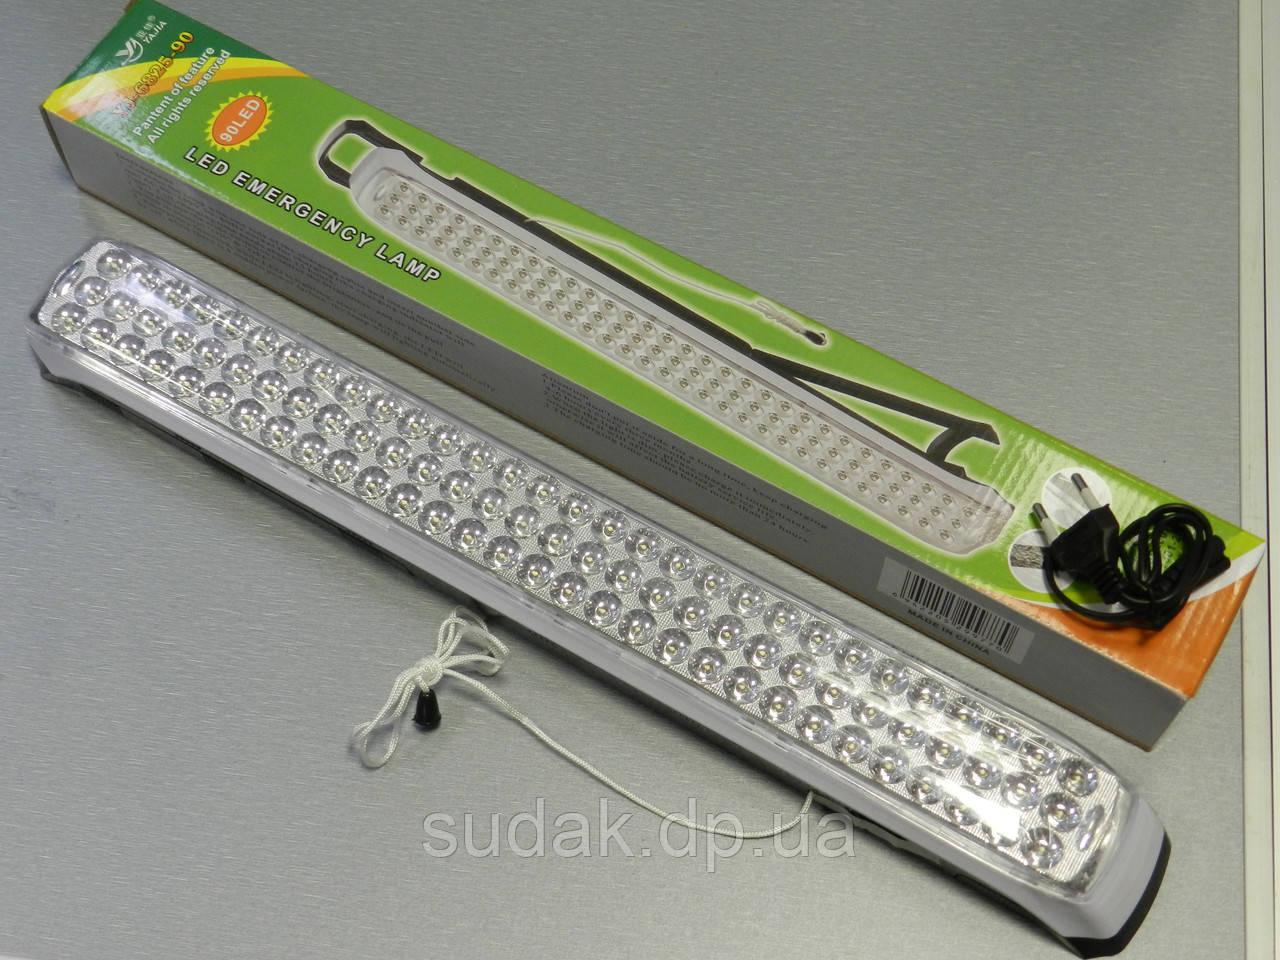 Фонарь аварийный аккумуляторныйYJ-6825-90